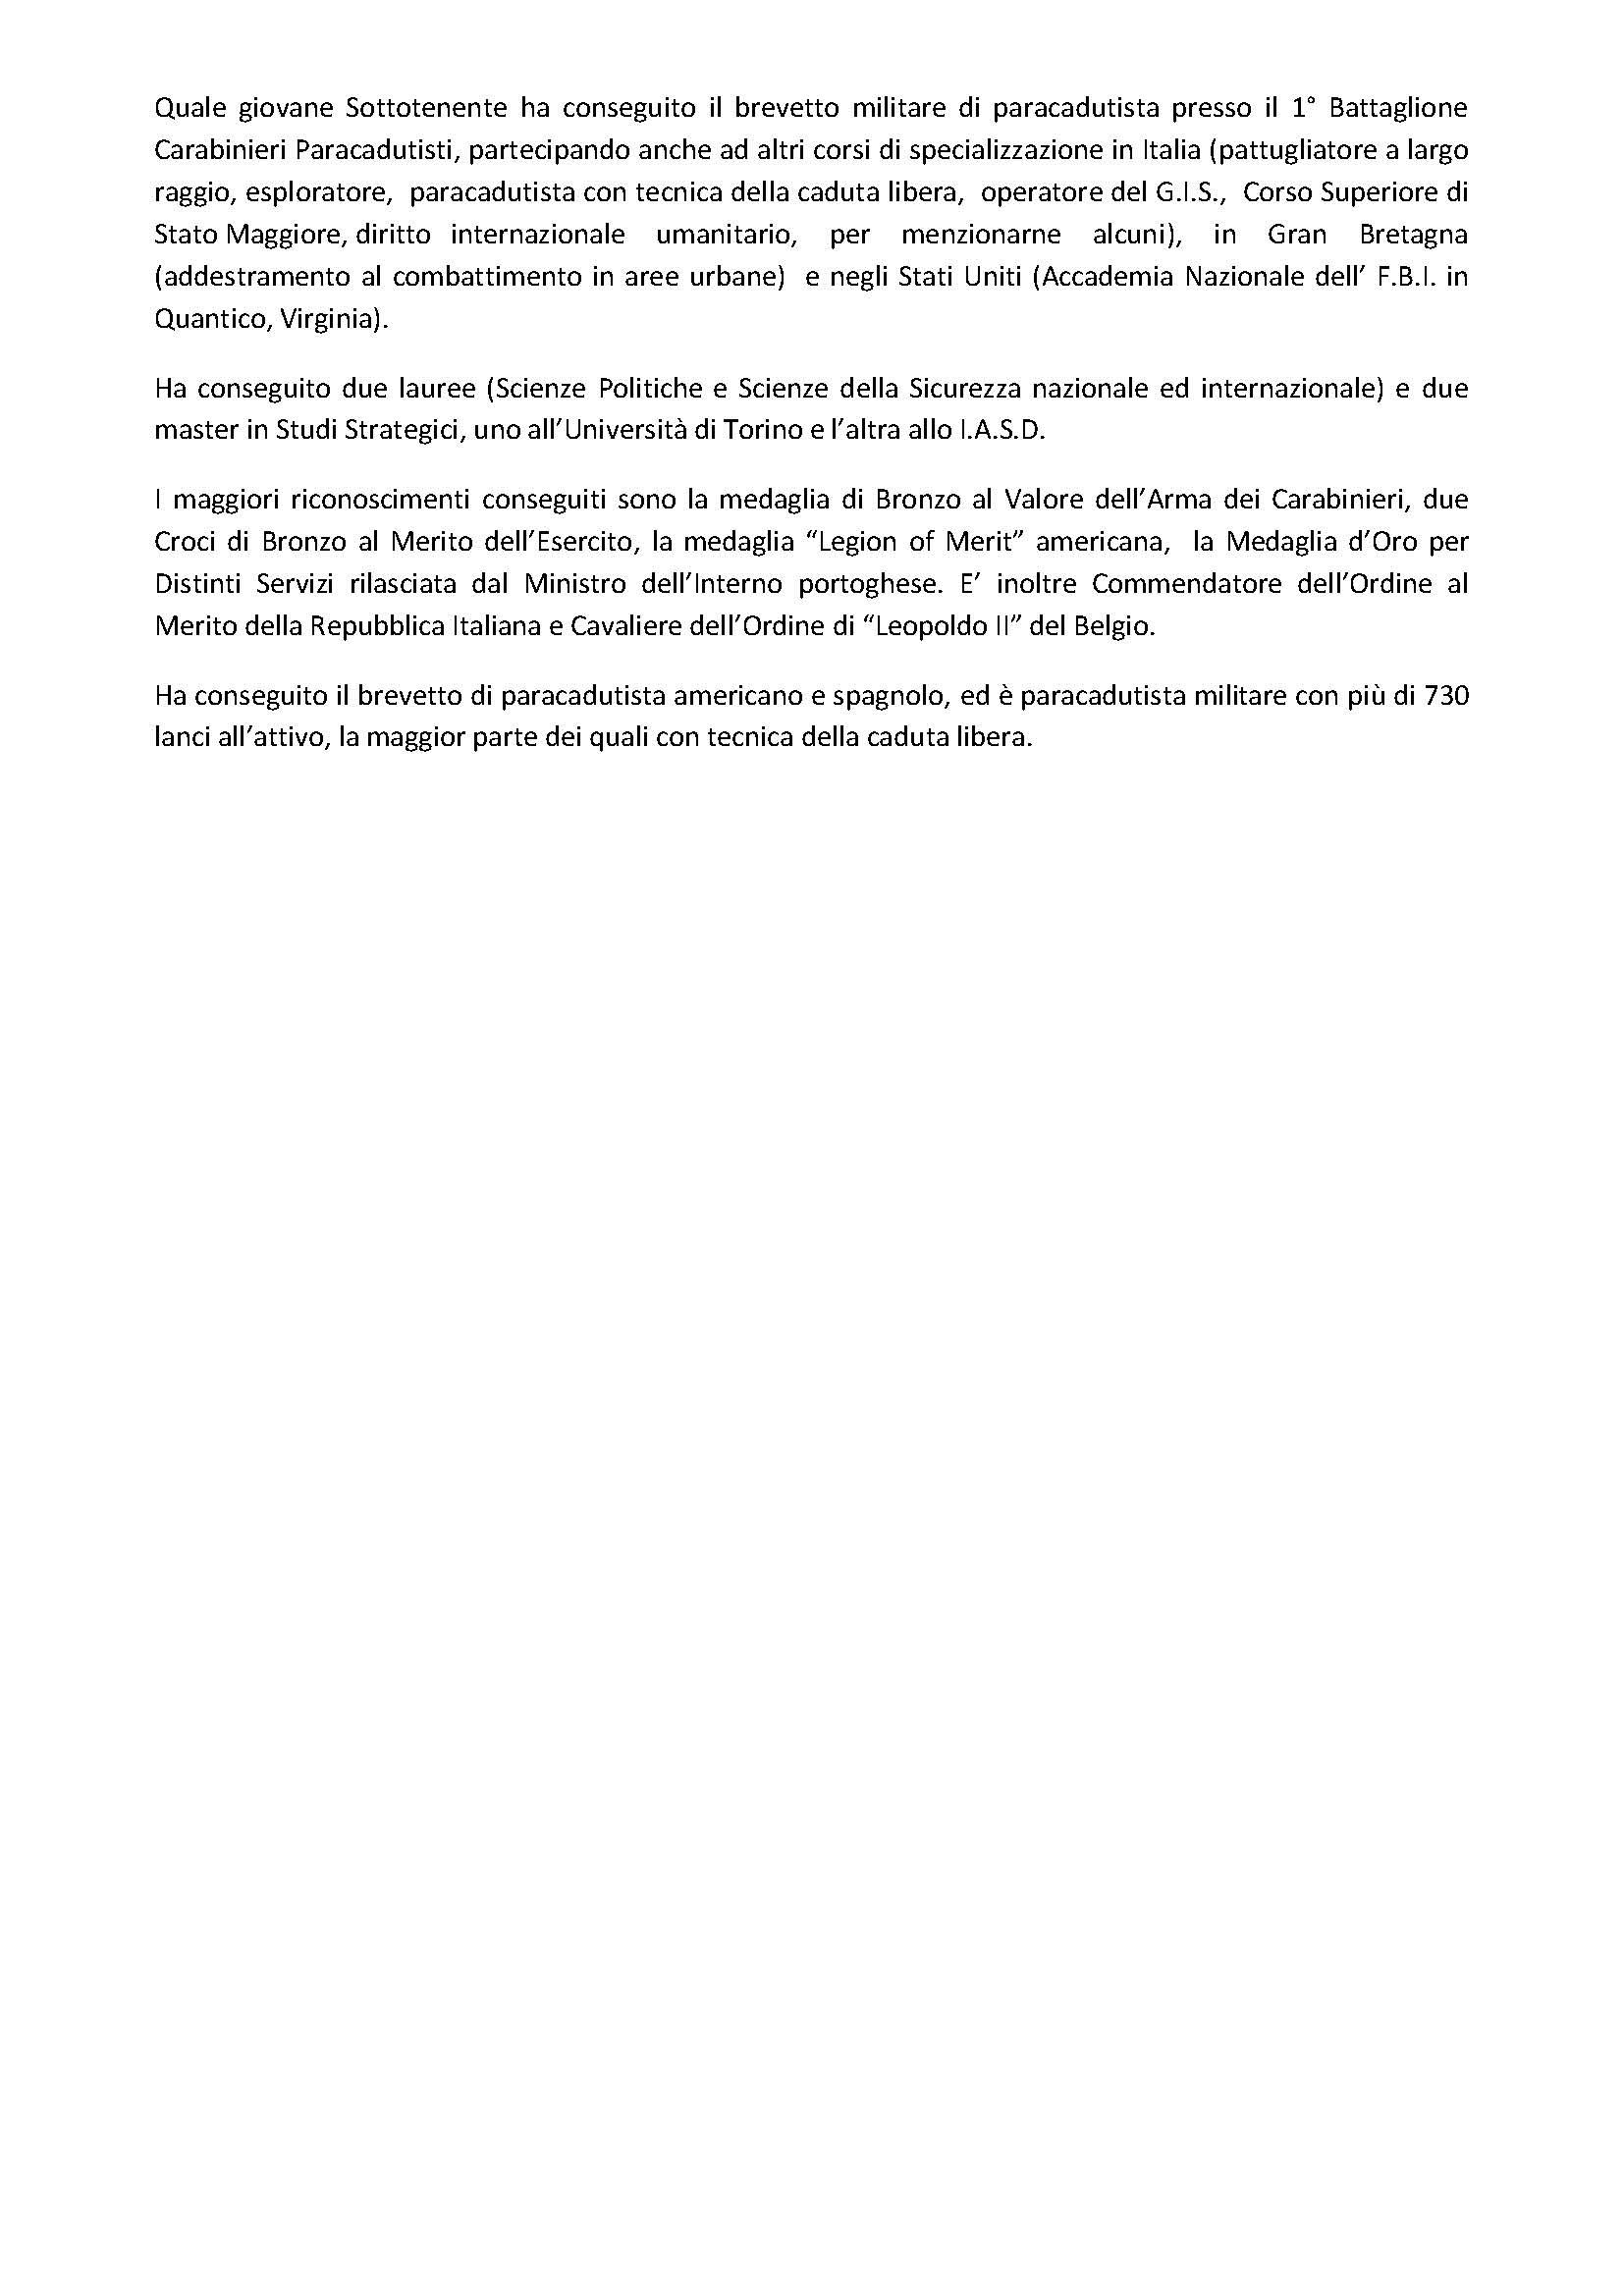 Curriculum Vitae Gen. C.A. Carmelo BURGIO (1)_Pagina_2